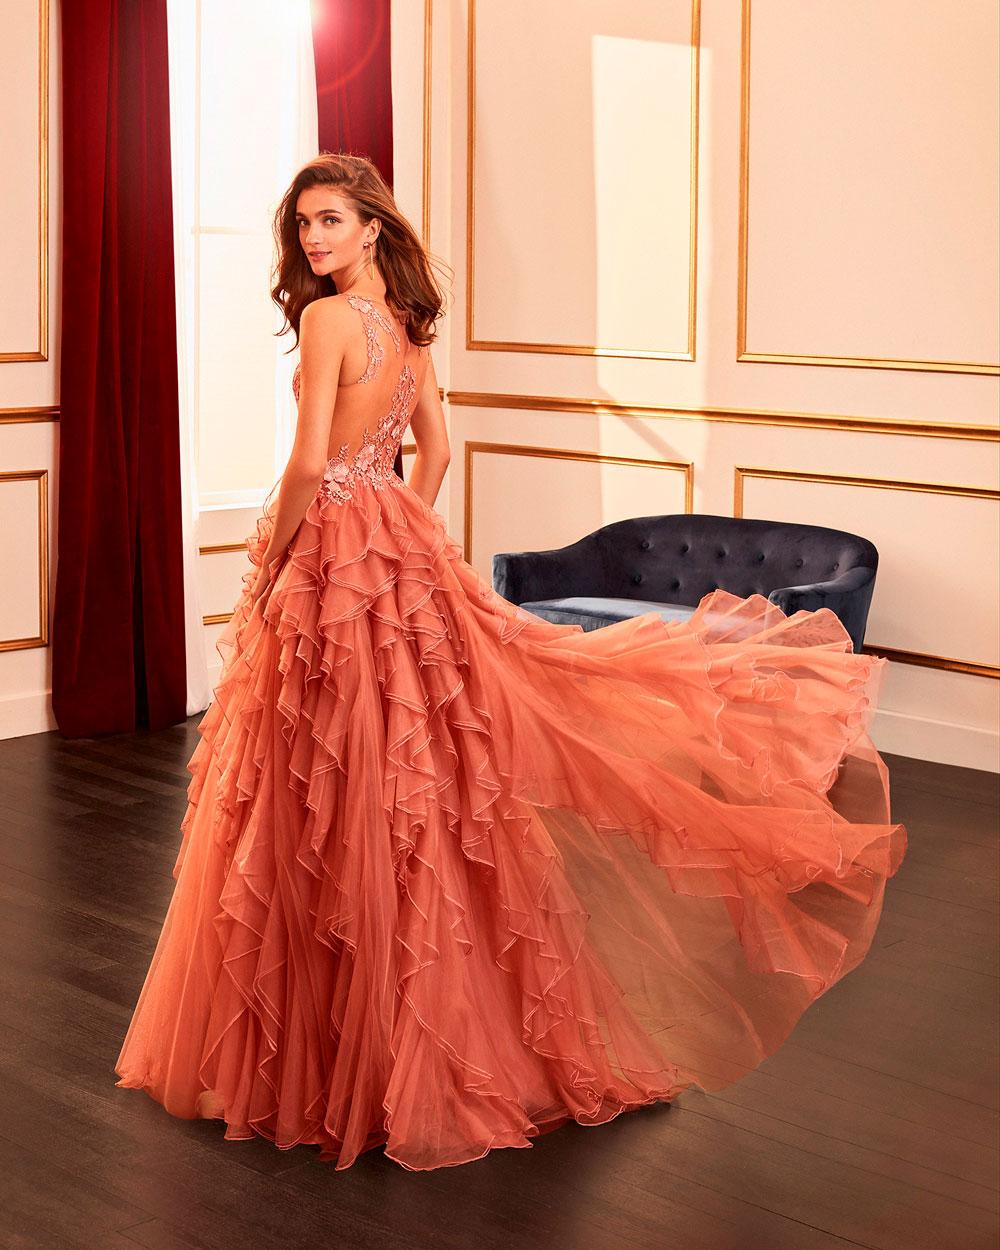 vestido de fiesta 2020 4J2F3 MARFIL BARCELONA 1